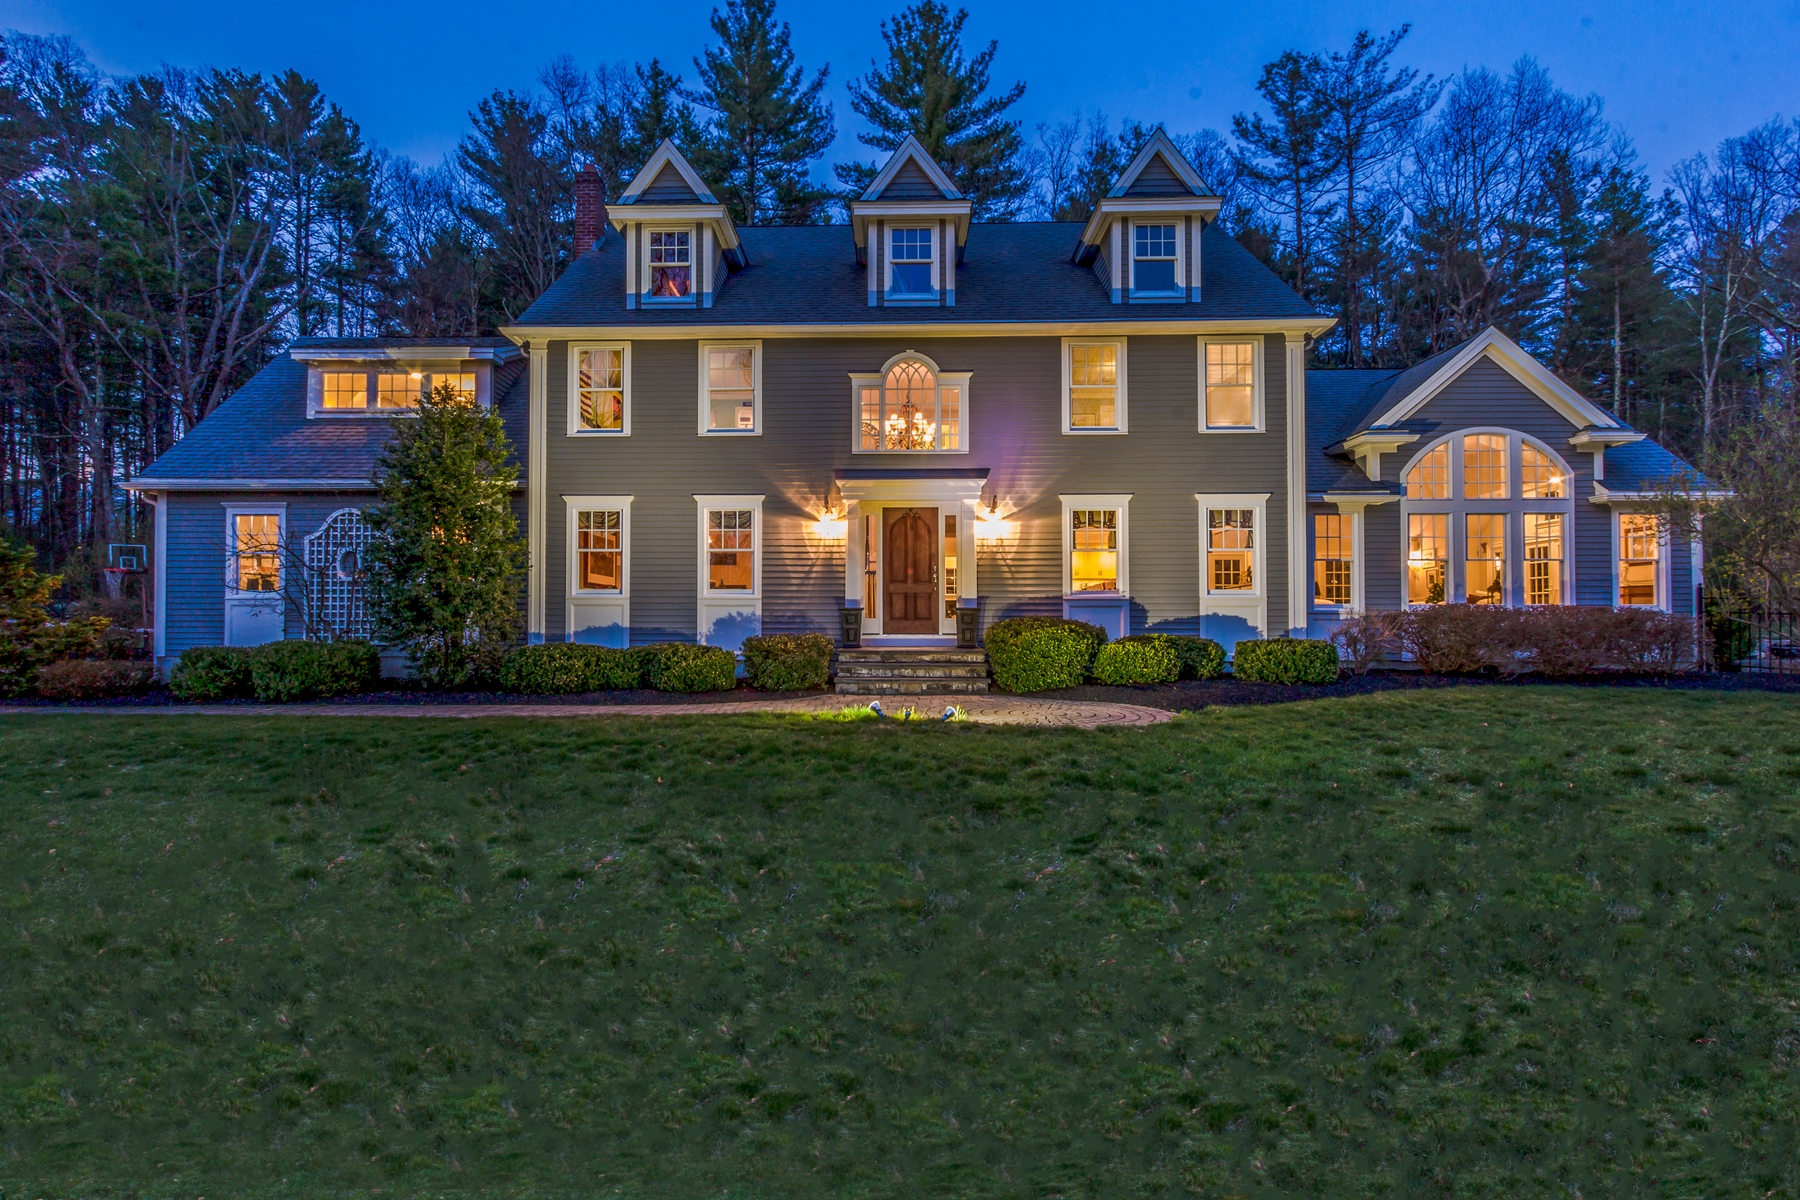 Casa Unifamiliar por un Venta en Elegant Colonial on Private Lot 14 Plumbley Road Upton, Massachusetts 01568 Estados Unidos